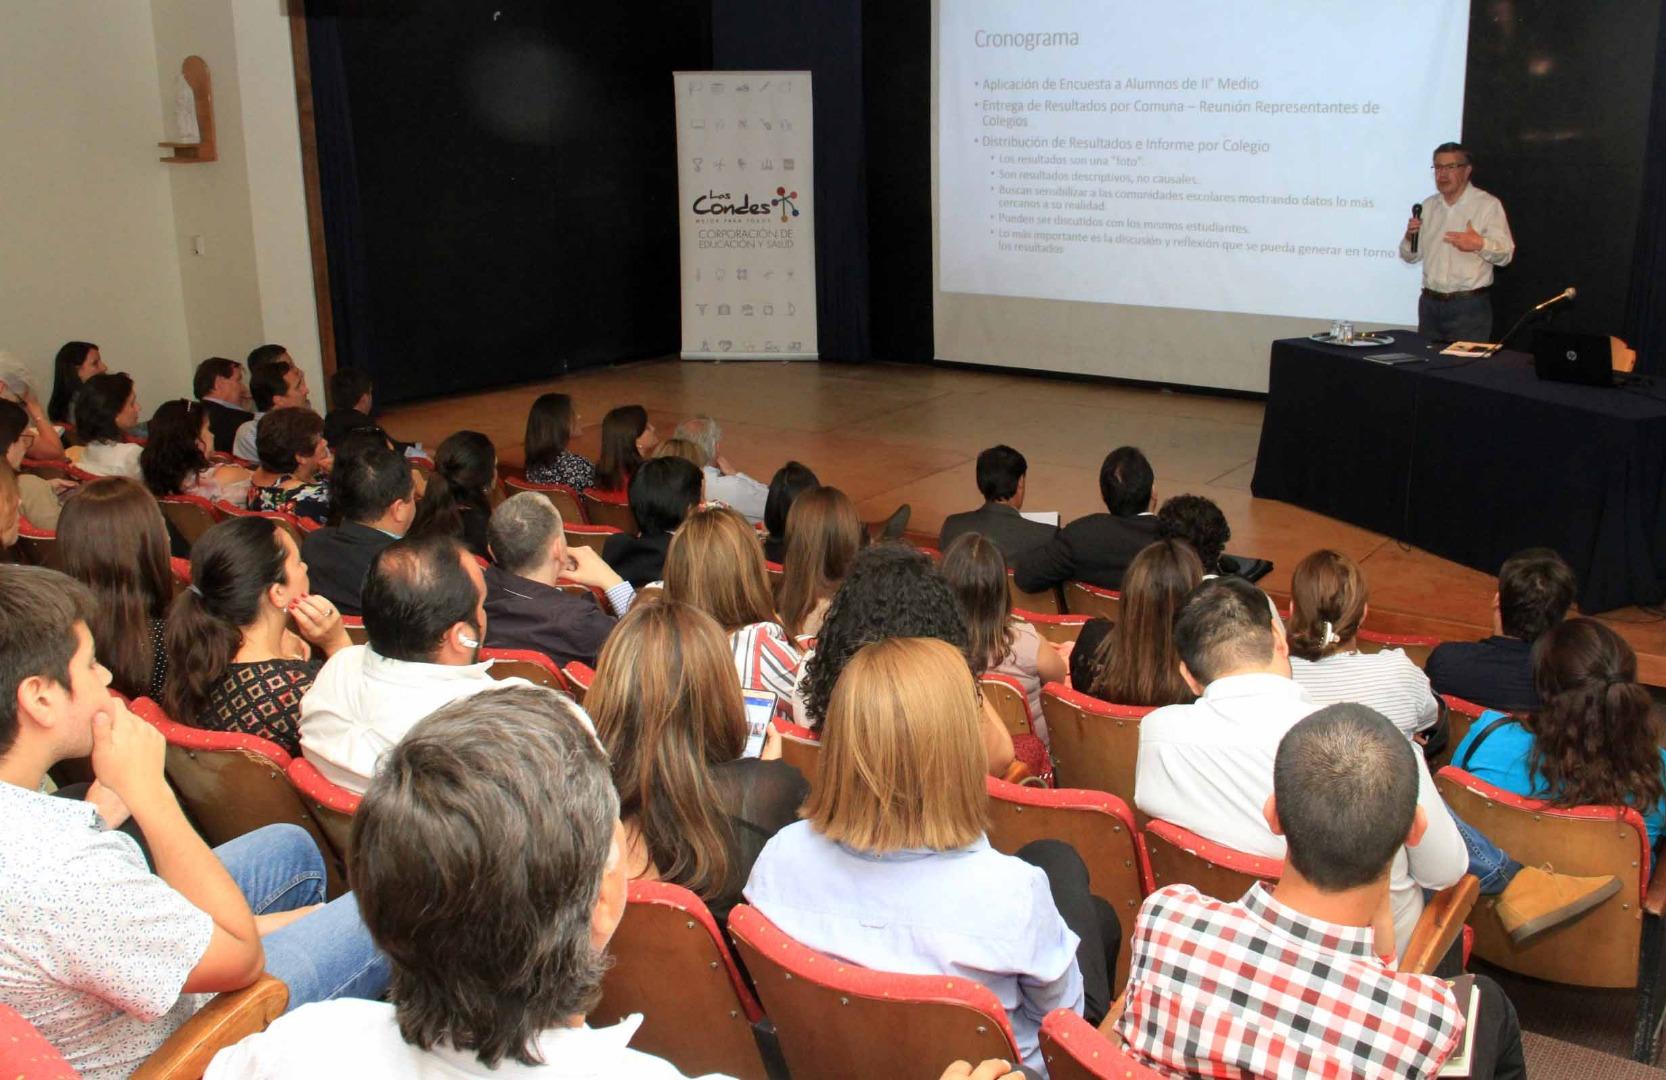 Alcalde Joaquín Lavín presenta resultados a asistentes